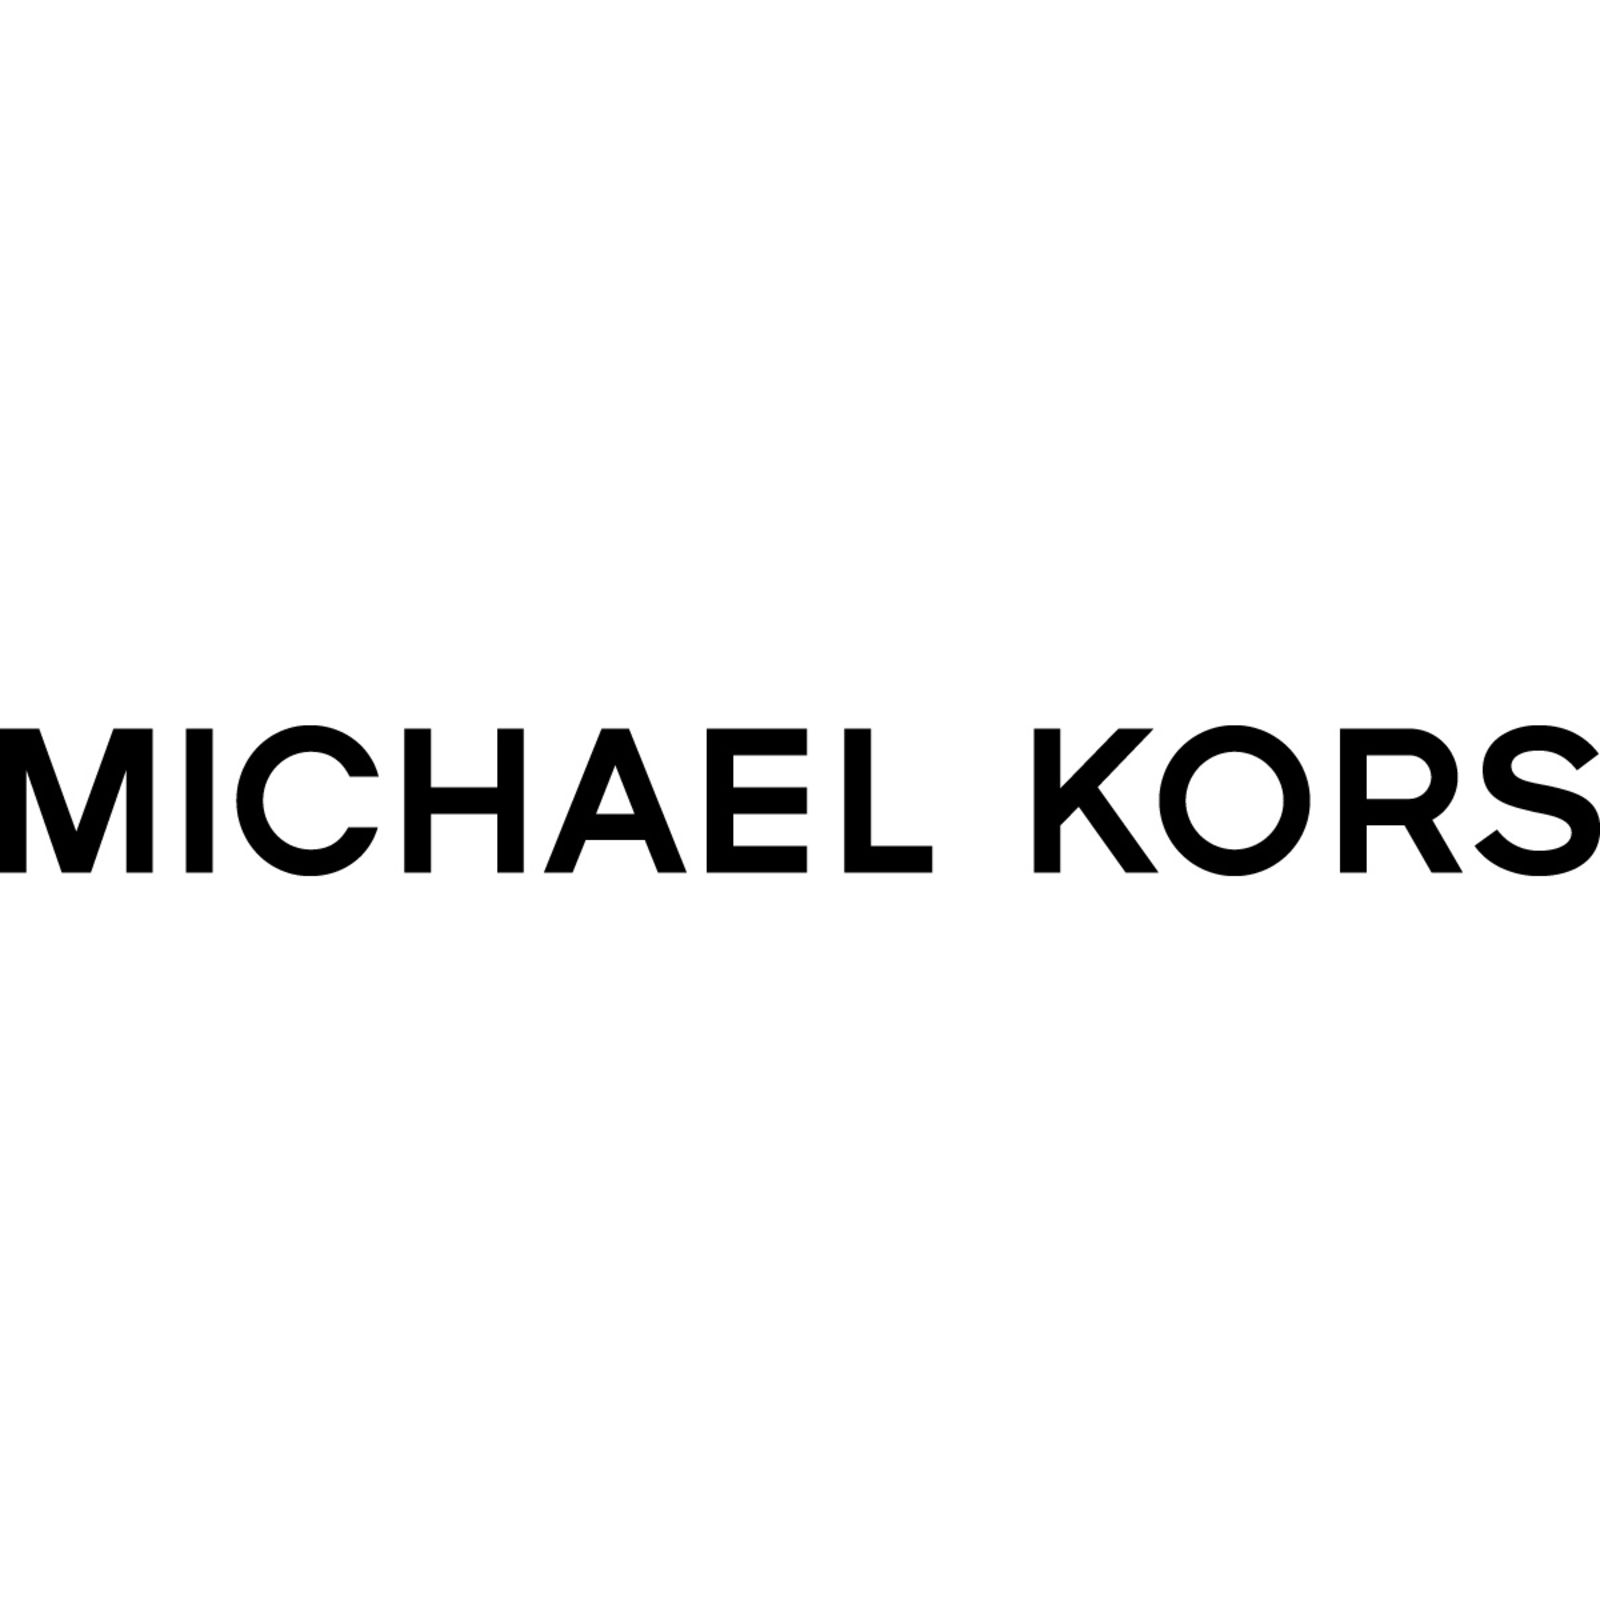 MICHAEL KORS Eyewear (Bild 1)